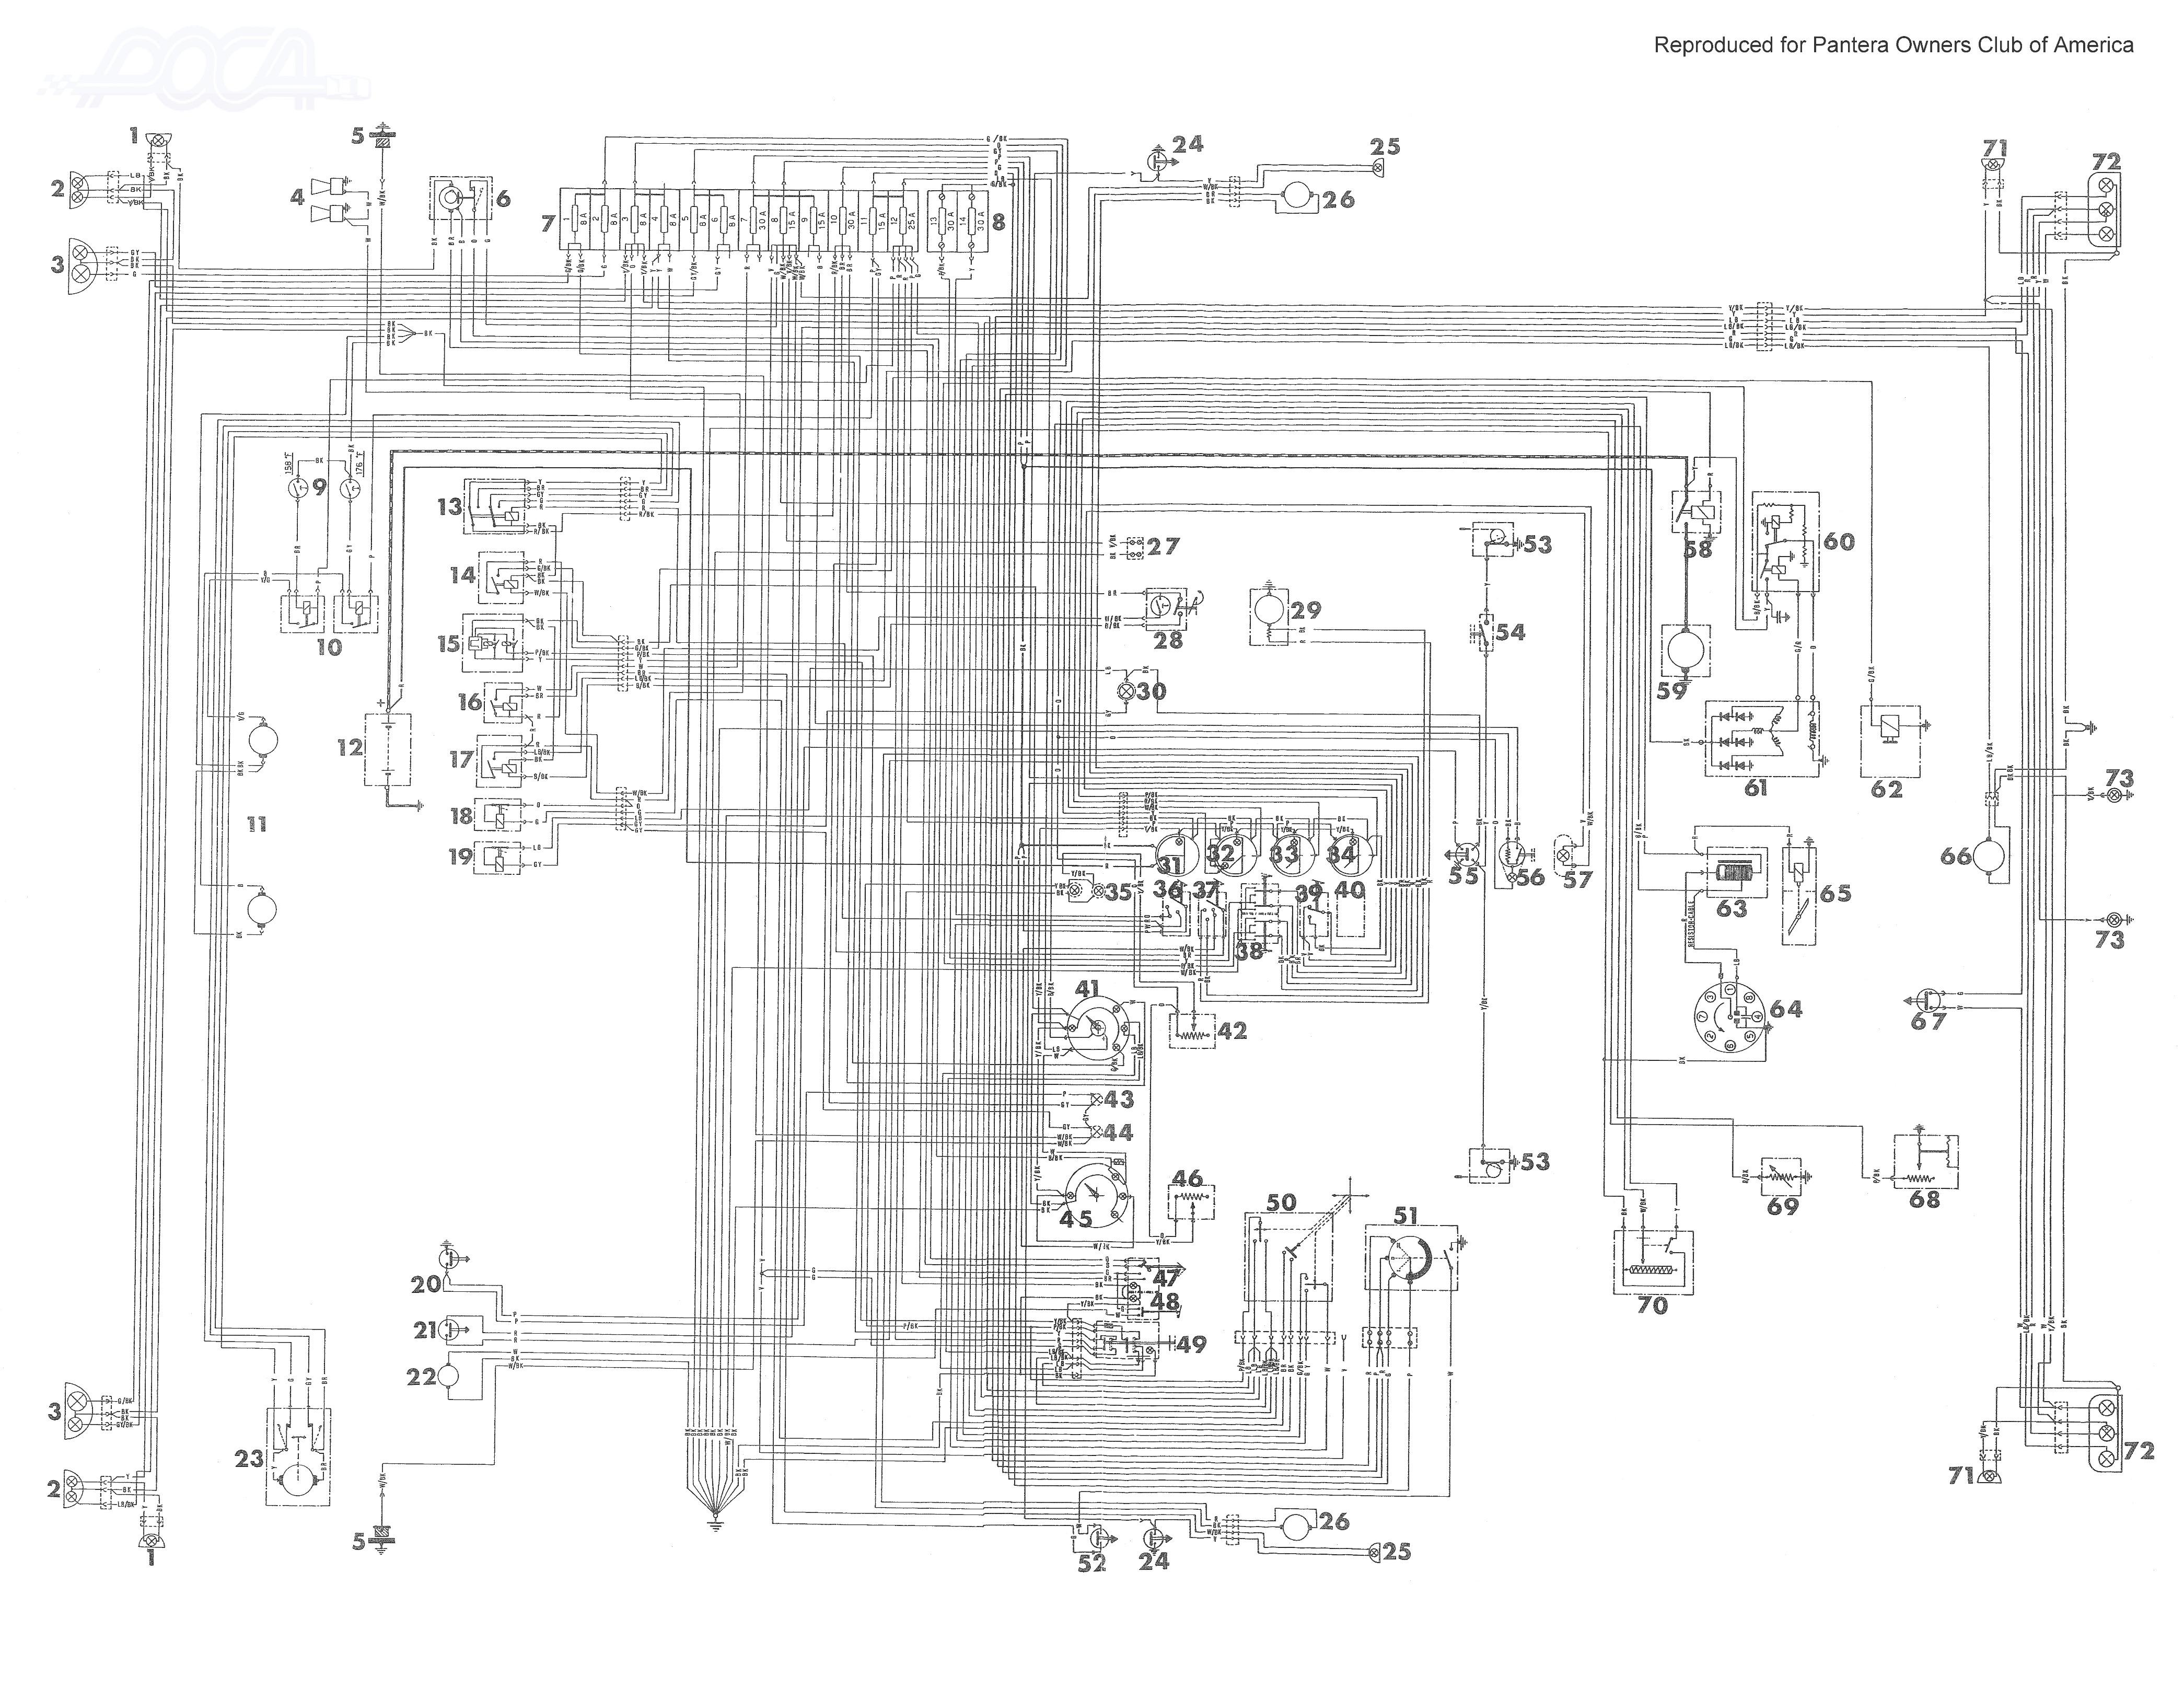 wiring diagram ecu hyundai accent ford galaxy santro free for you india blogs rh 13 2 restaurant freinsheimer hof de